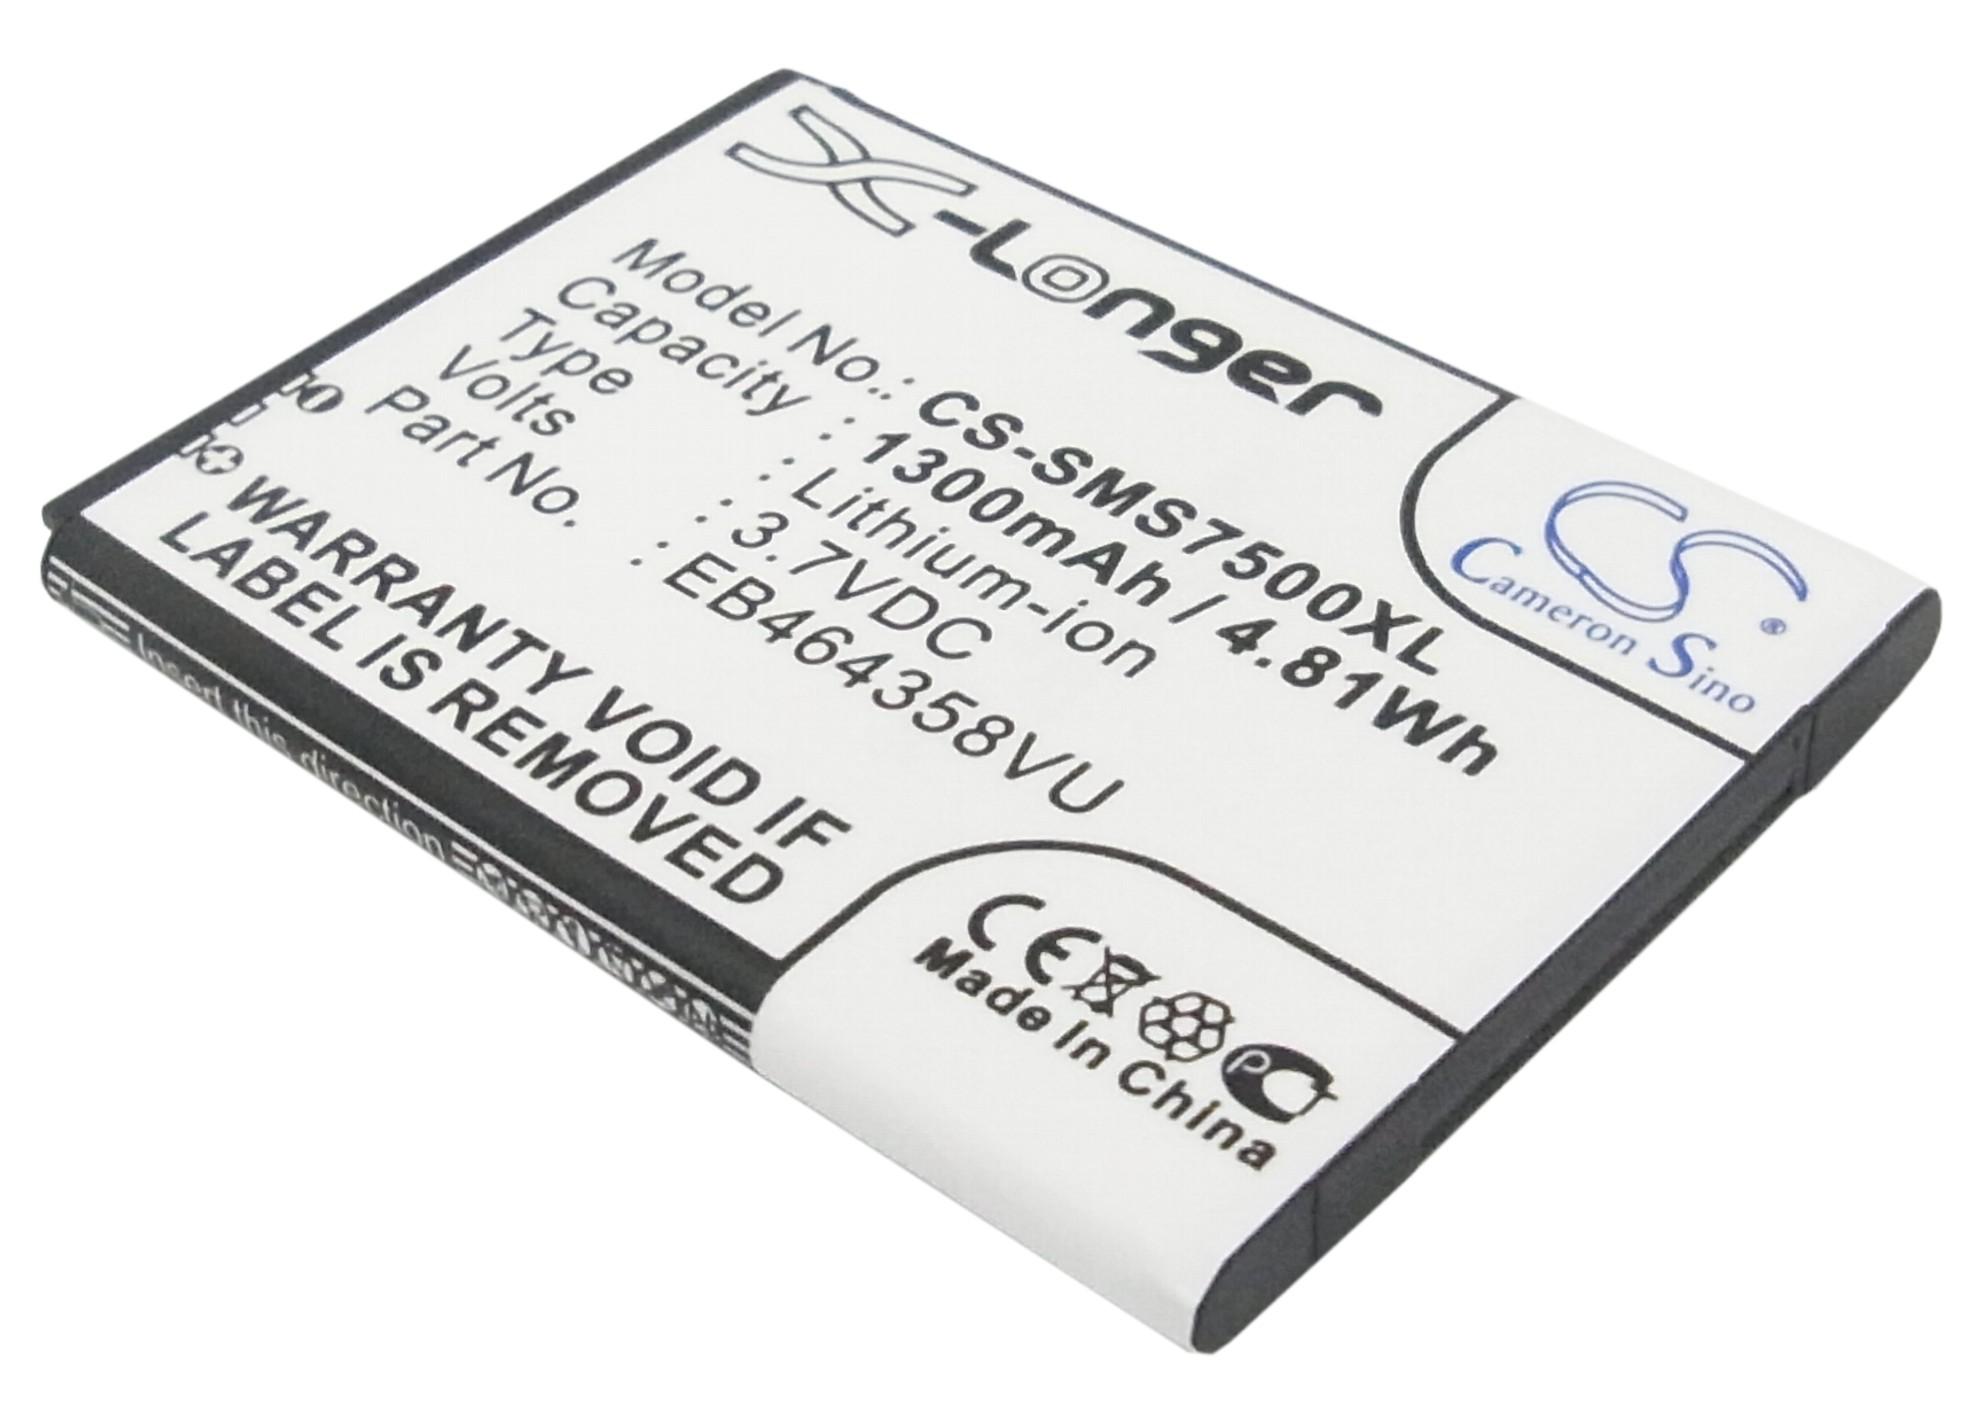 Cameron Sino baterie do mobilů pro SAMSUNG Galaxy Ace Q 3.7V Li-ion 1300mAh černá - neoriginální